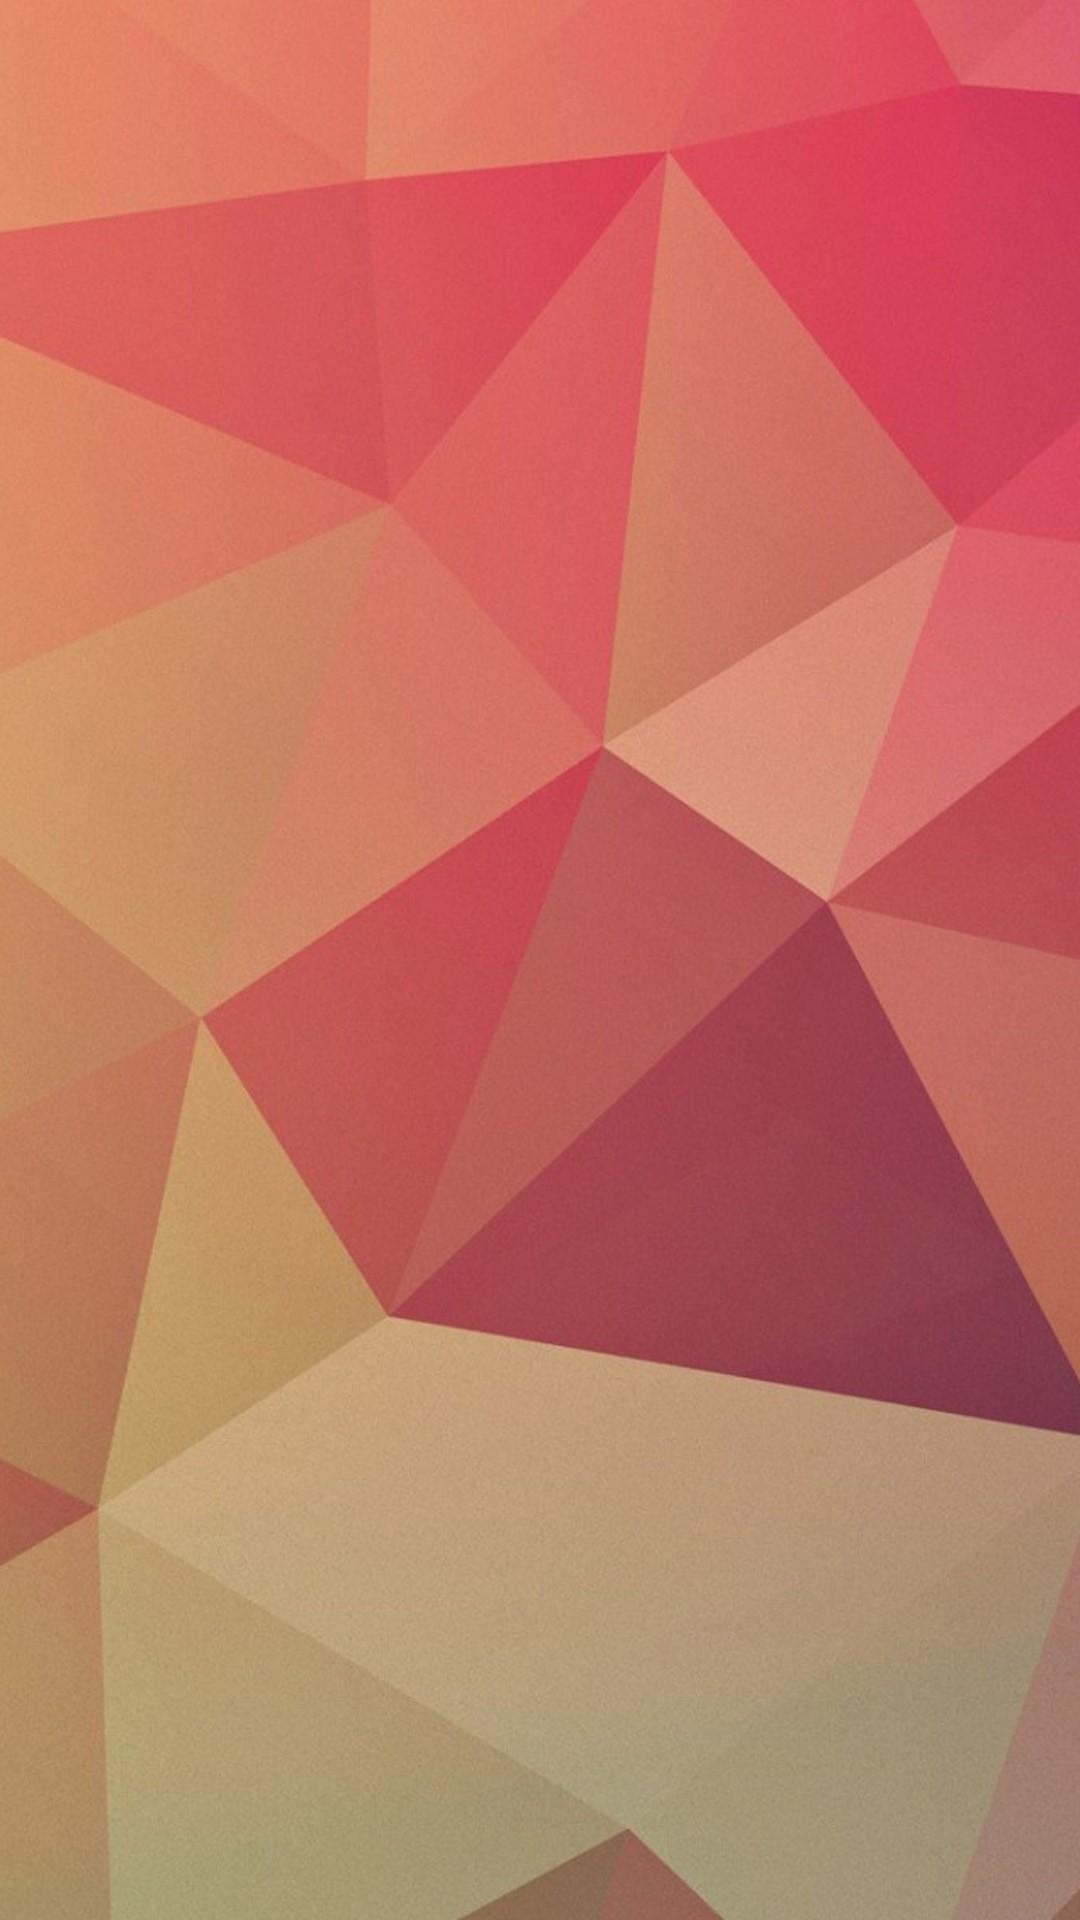 Geometric wallpaper for iphone